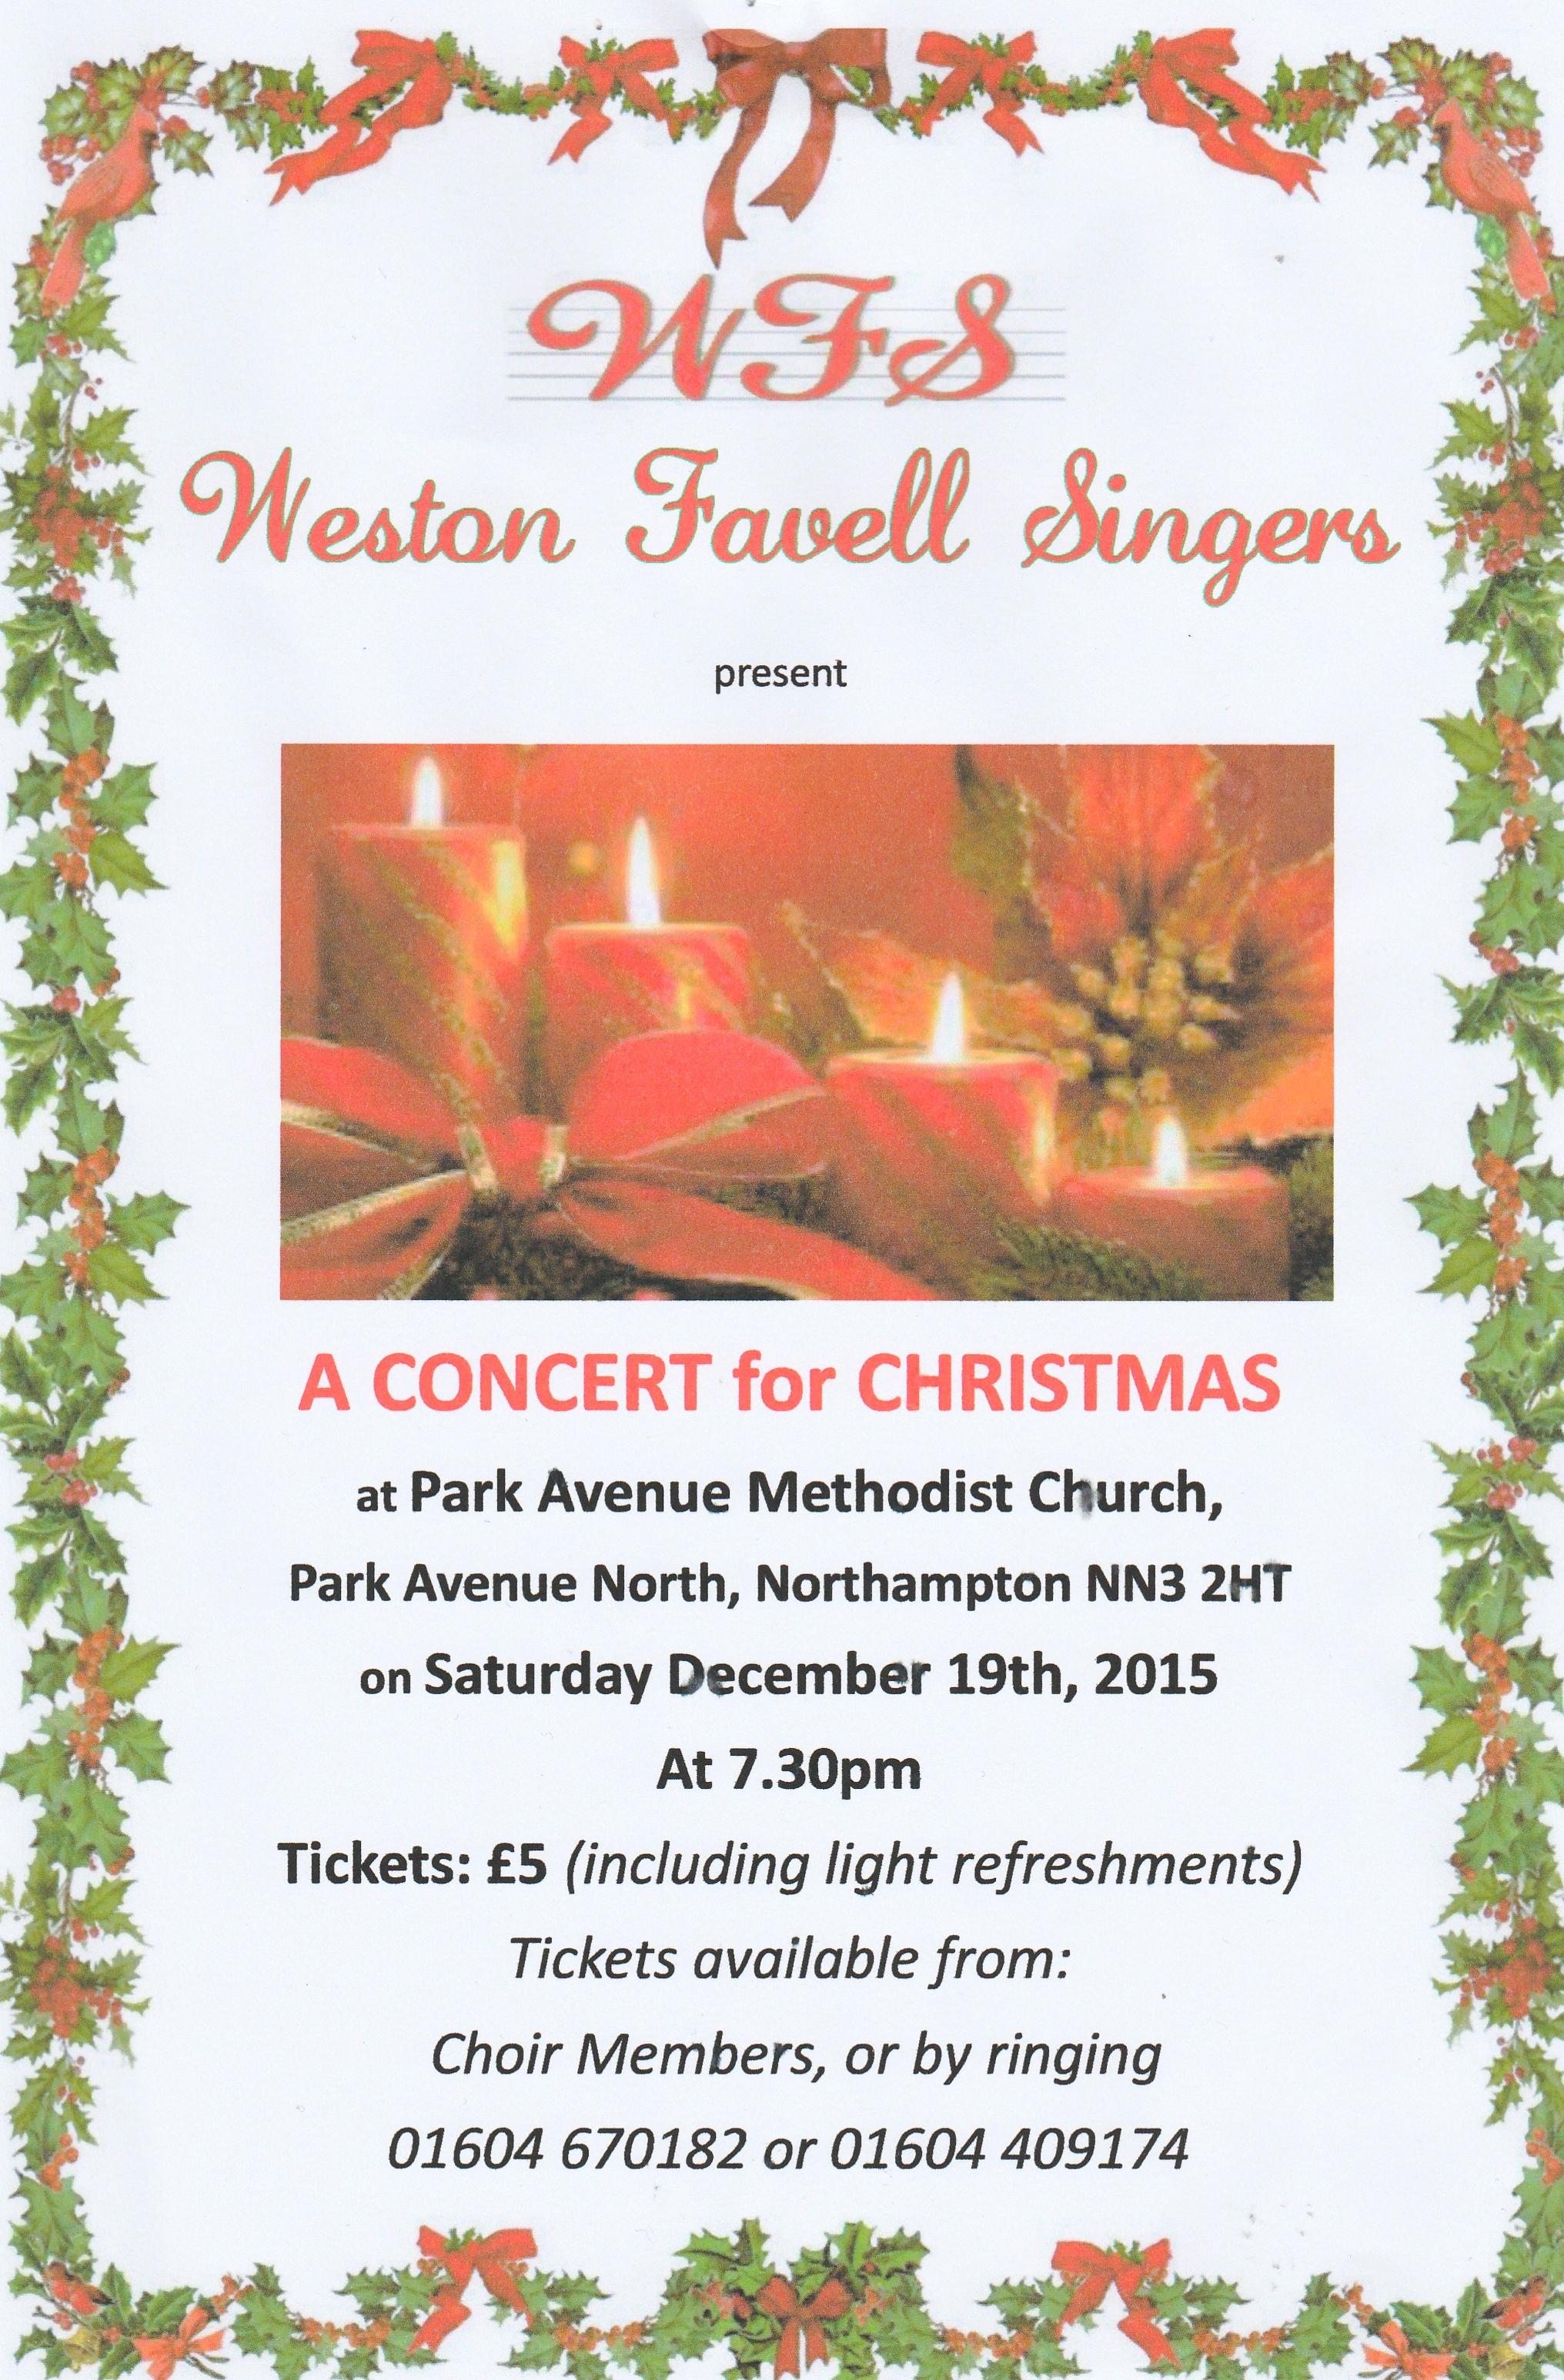 Weston-Favell-Singers.jpg